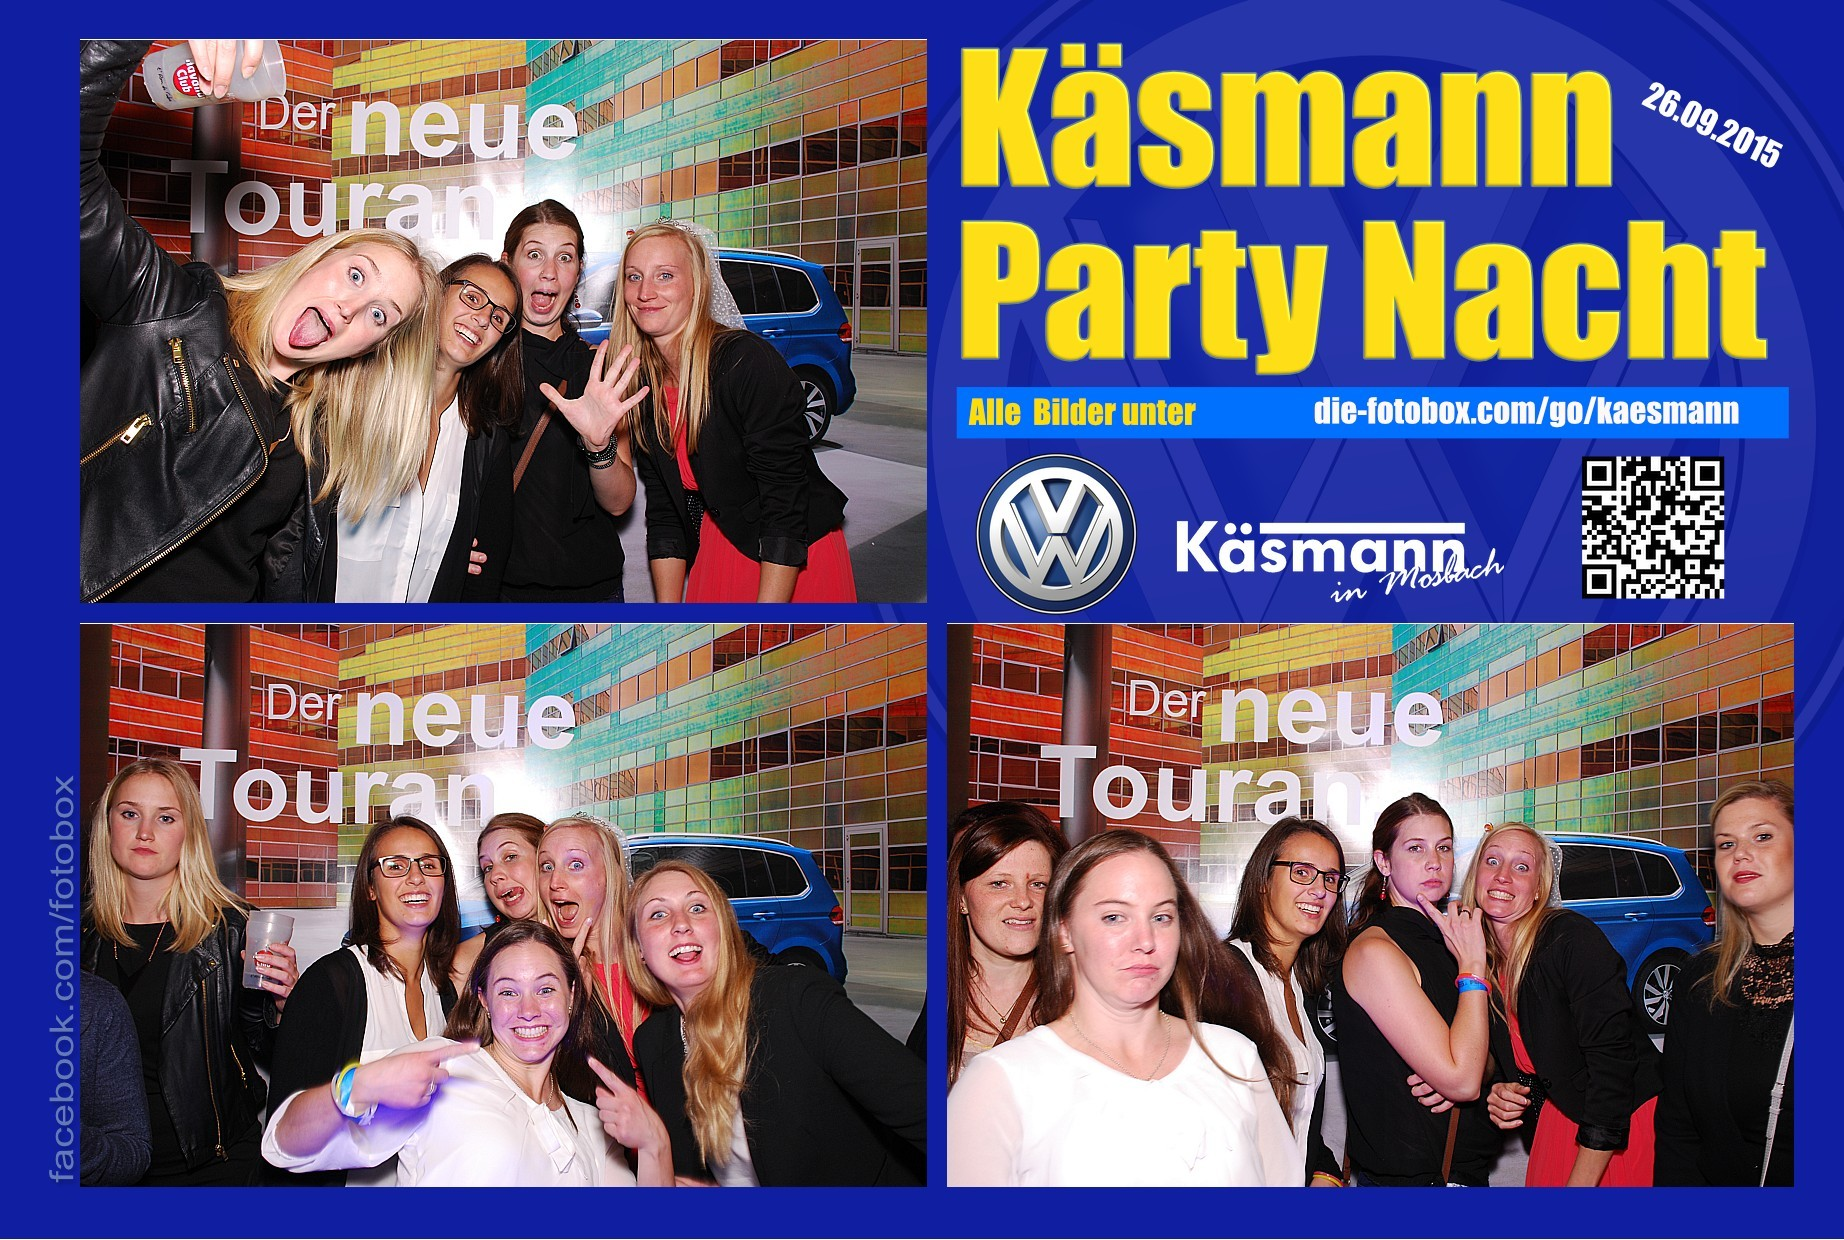 Käsmannparty 2015 - www.die-fotobox.com 01016